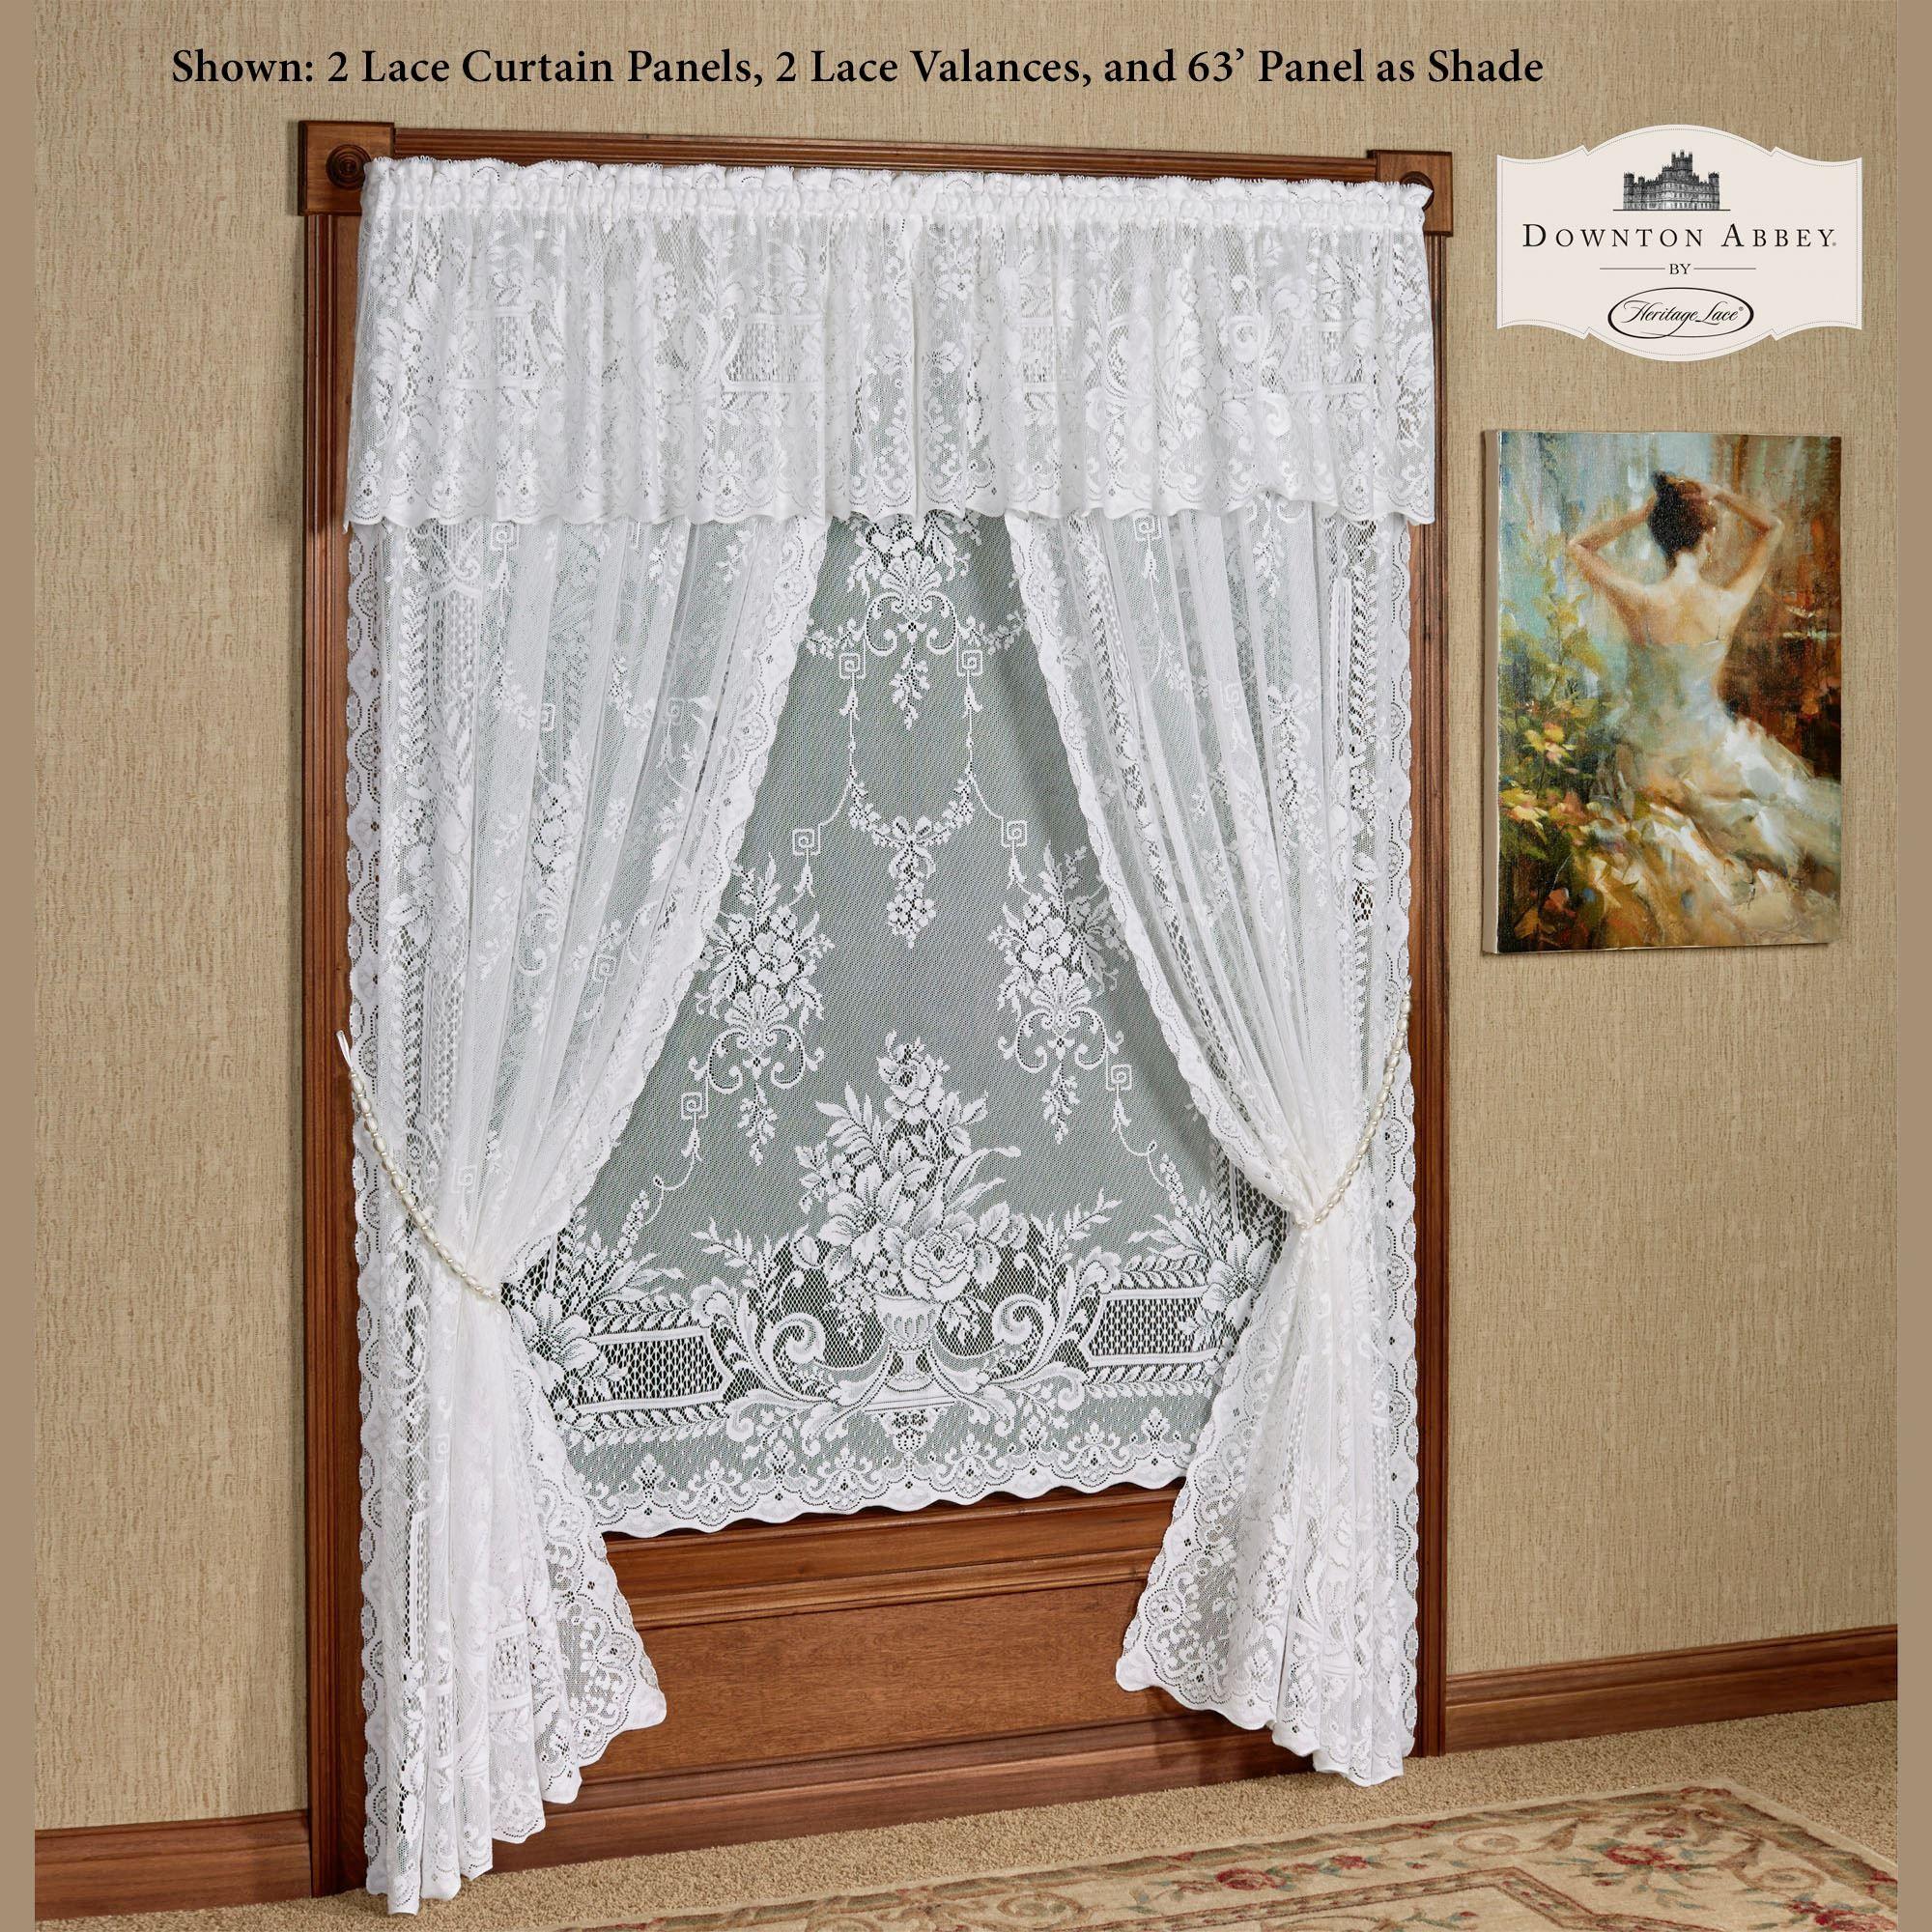 Aristocrat Lace Curtain Panel White Lace Curtains Lace Window